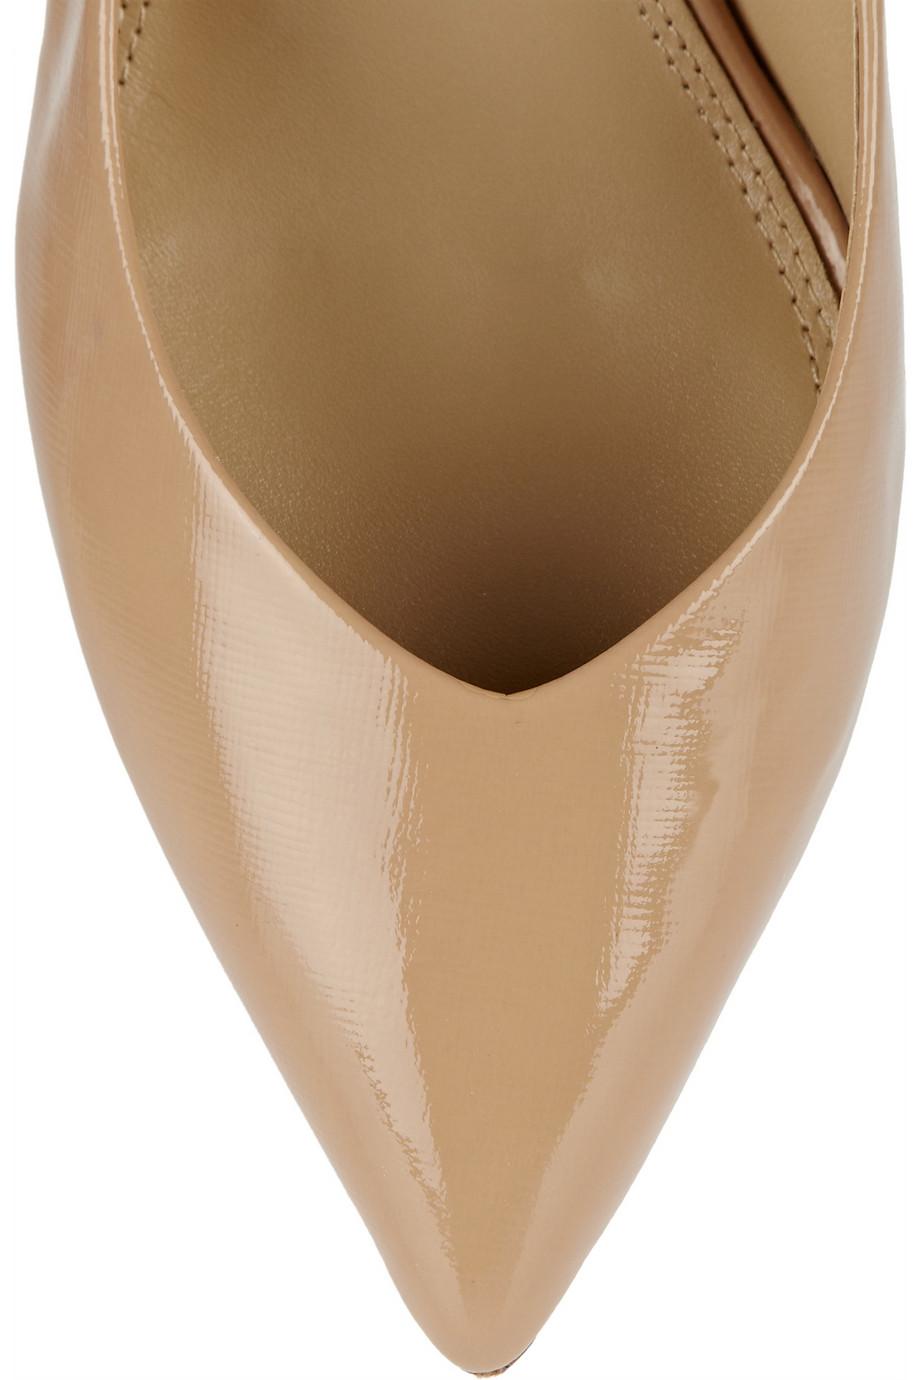 Diane von Furstenberg Park patent-leather wedge pumps – 50% at THE OUTNET.COM